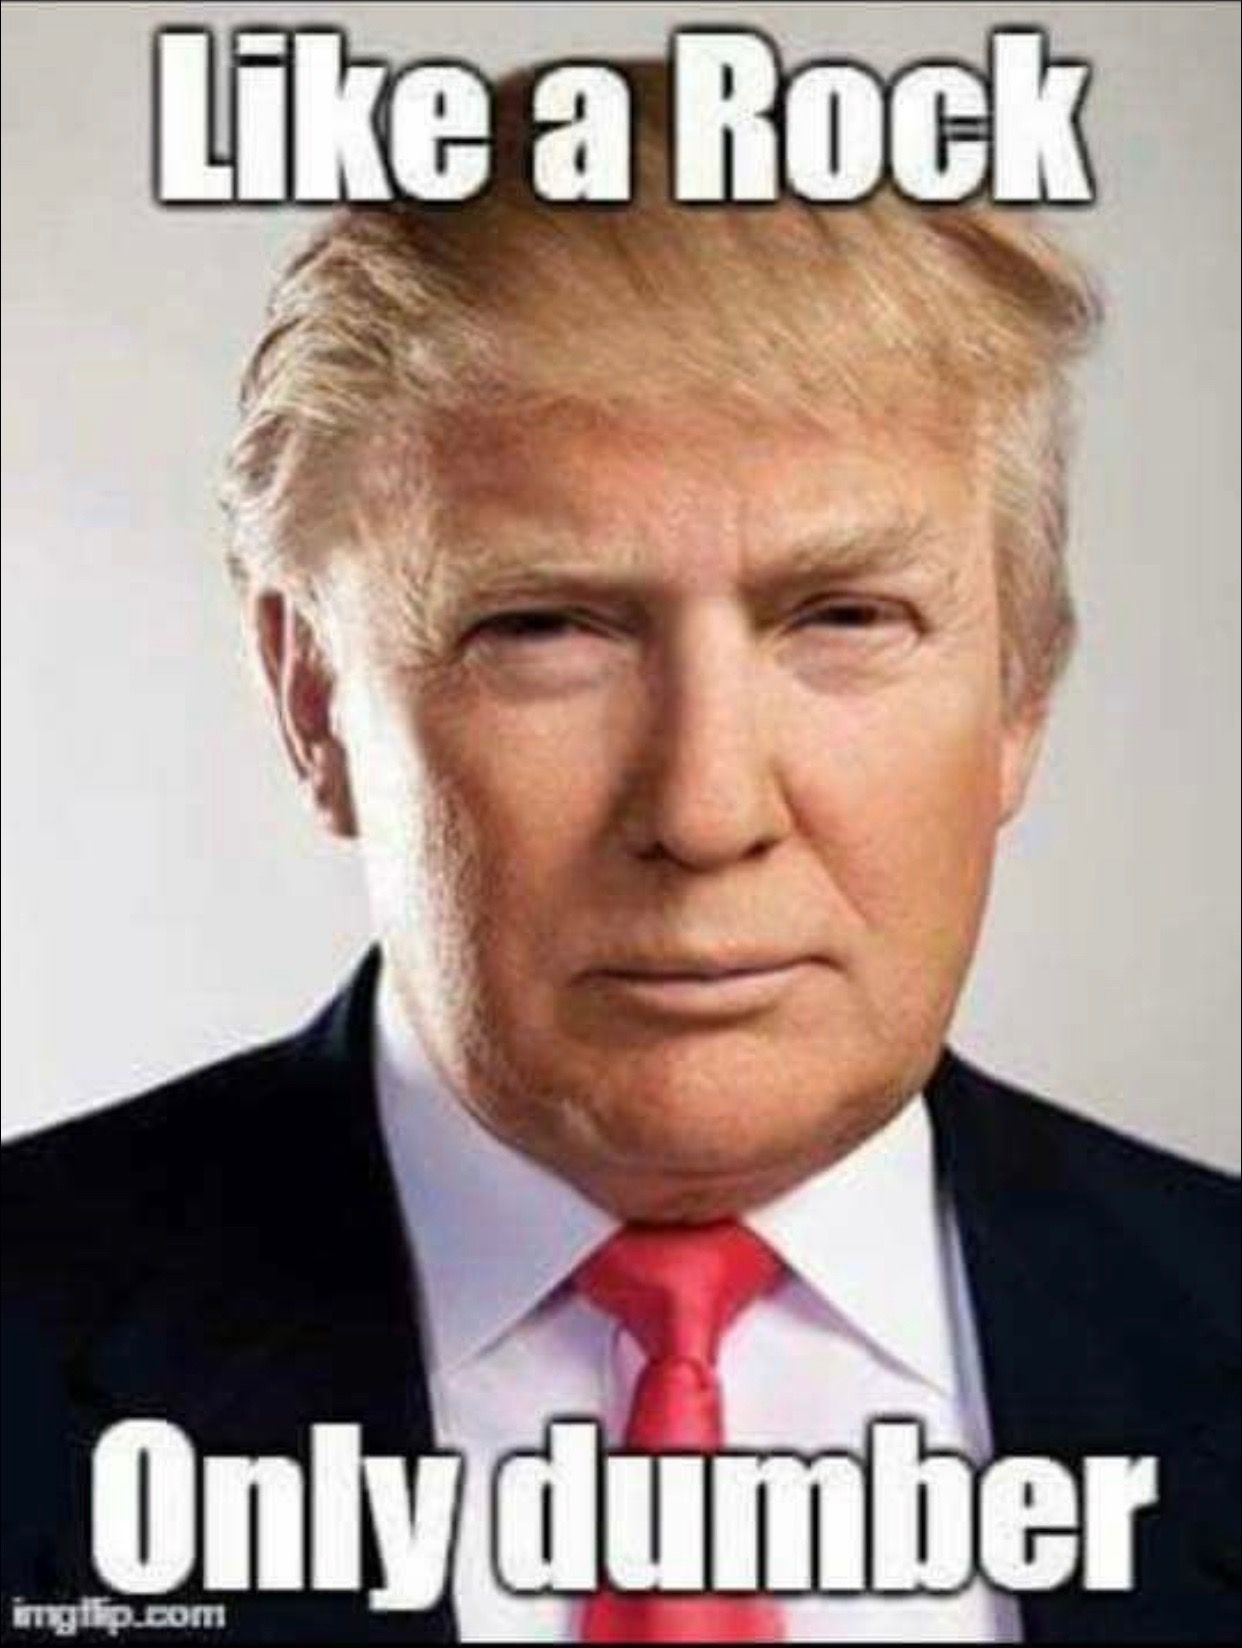 13620288 637429713079830 2276231311583805220 N (403 384) - Bathrooms - Pinterest - Donald Trump,